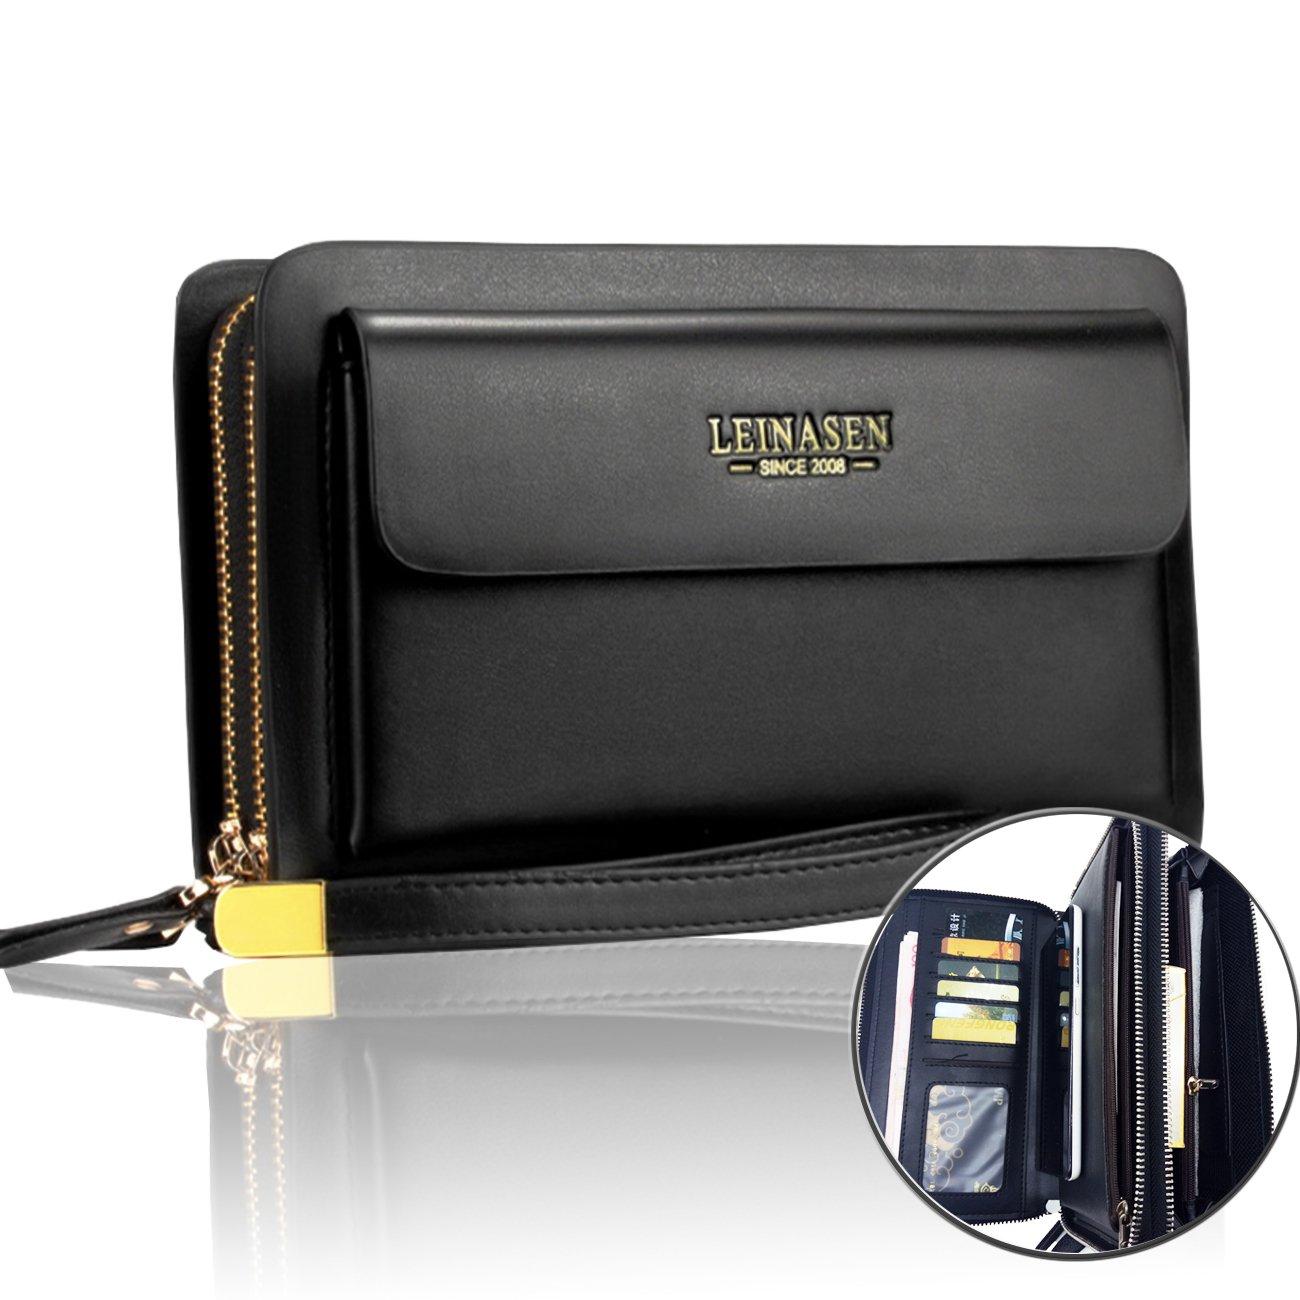 Sllybo Men Clutch Bag Business Handbag Wallet for Men Organizer Zipper Checkbook Wrist Bag (style 03)